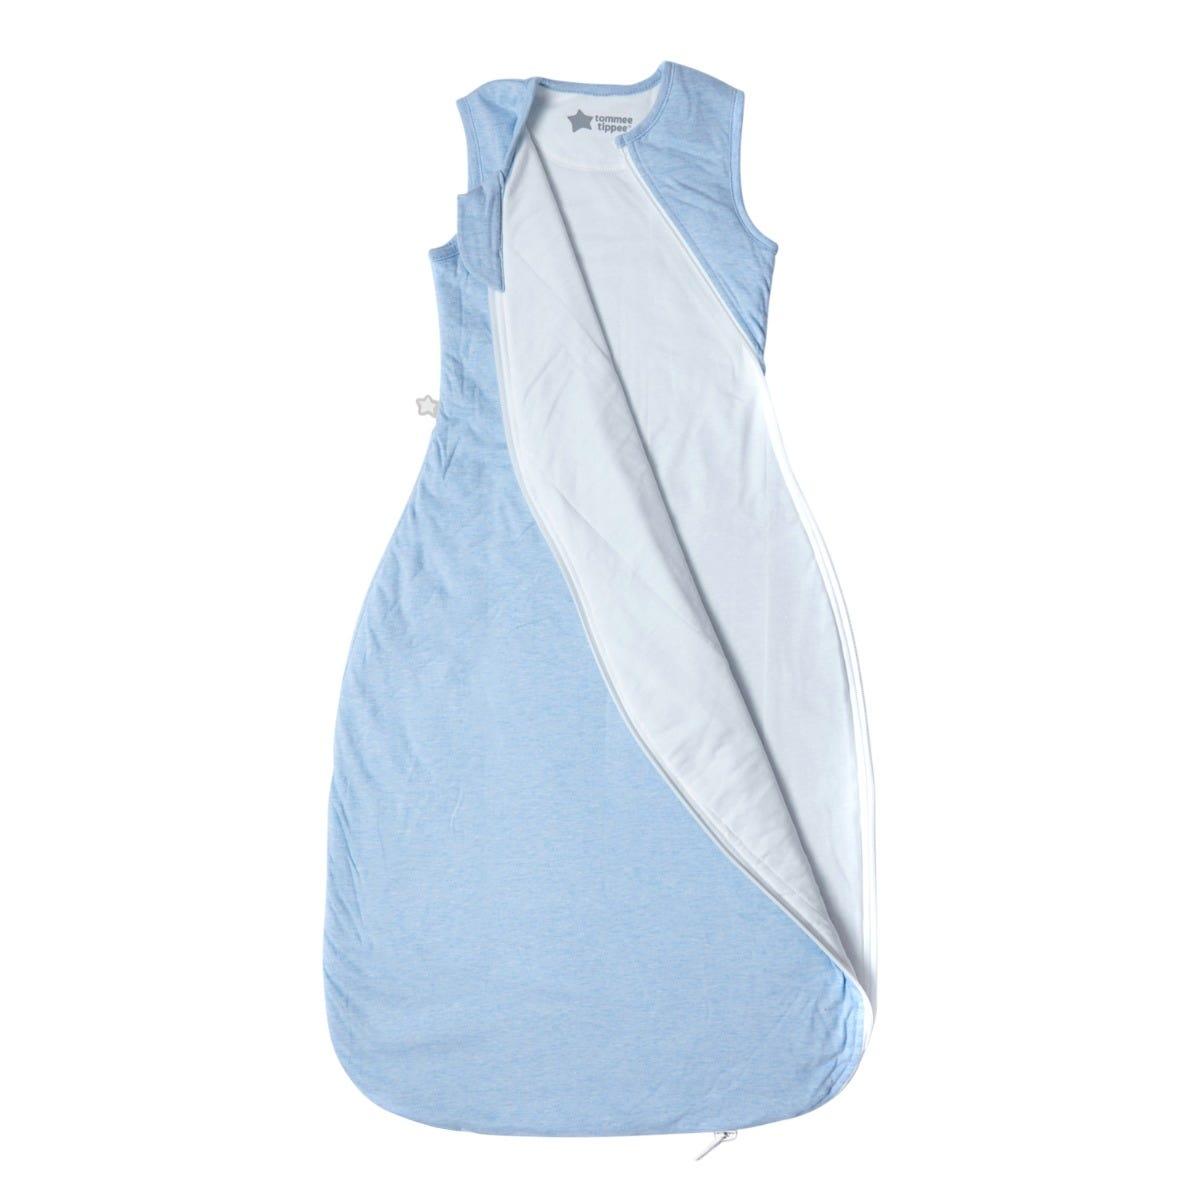 The Original Grobag Blue Marl Sleepbag zip open